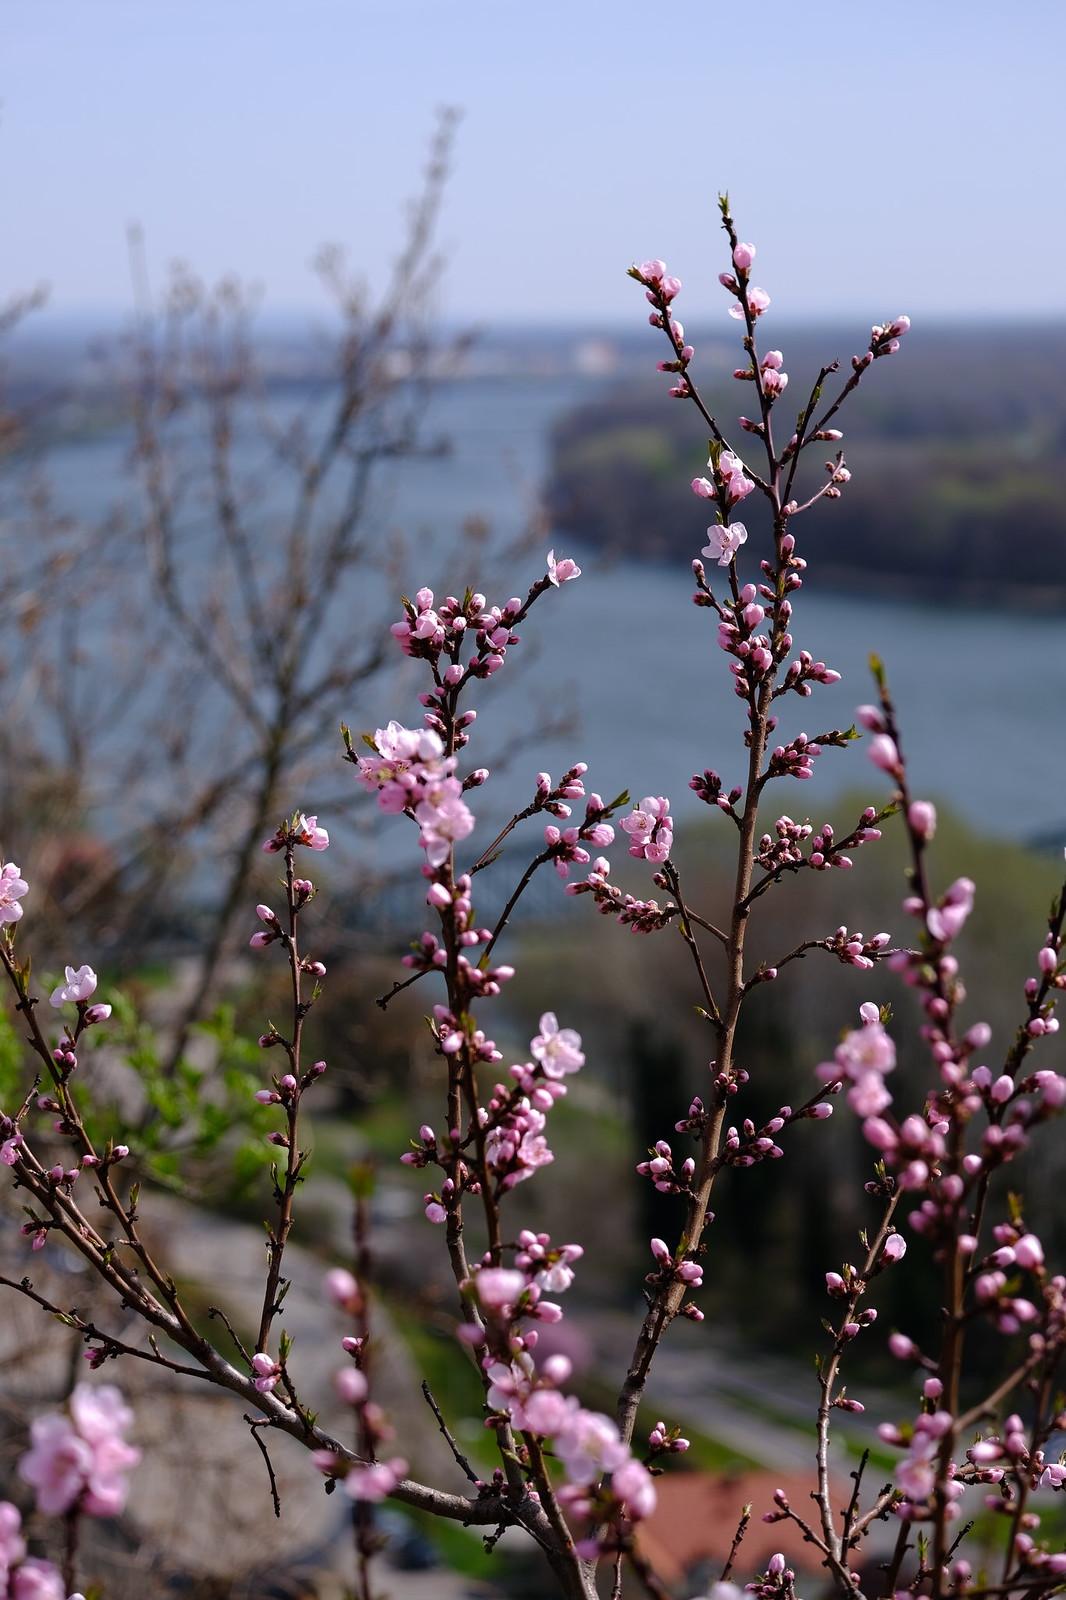 Blik over de Donau